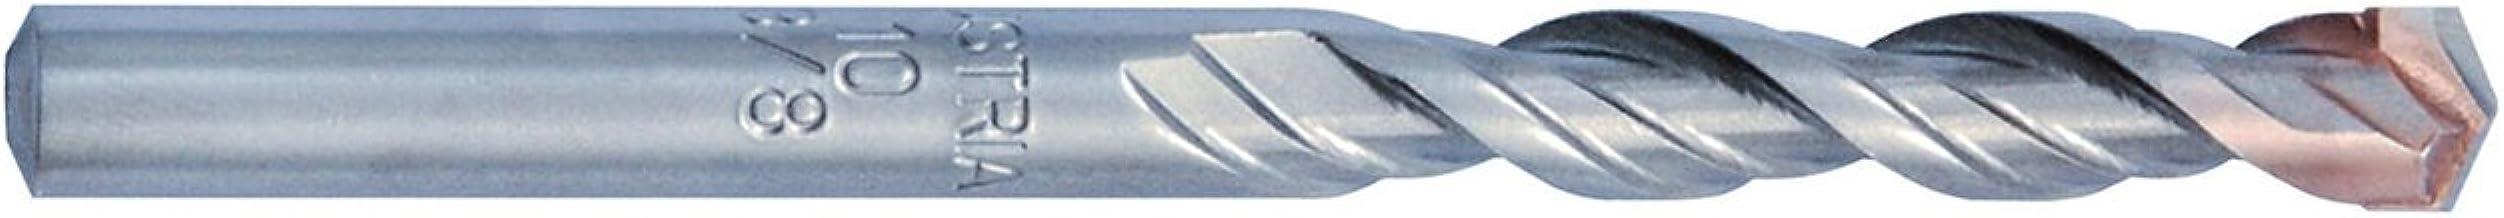 20 mm Broca en espiral para madera Projahn 19200